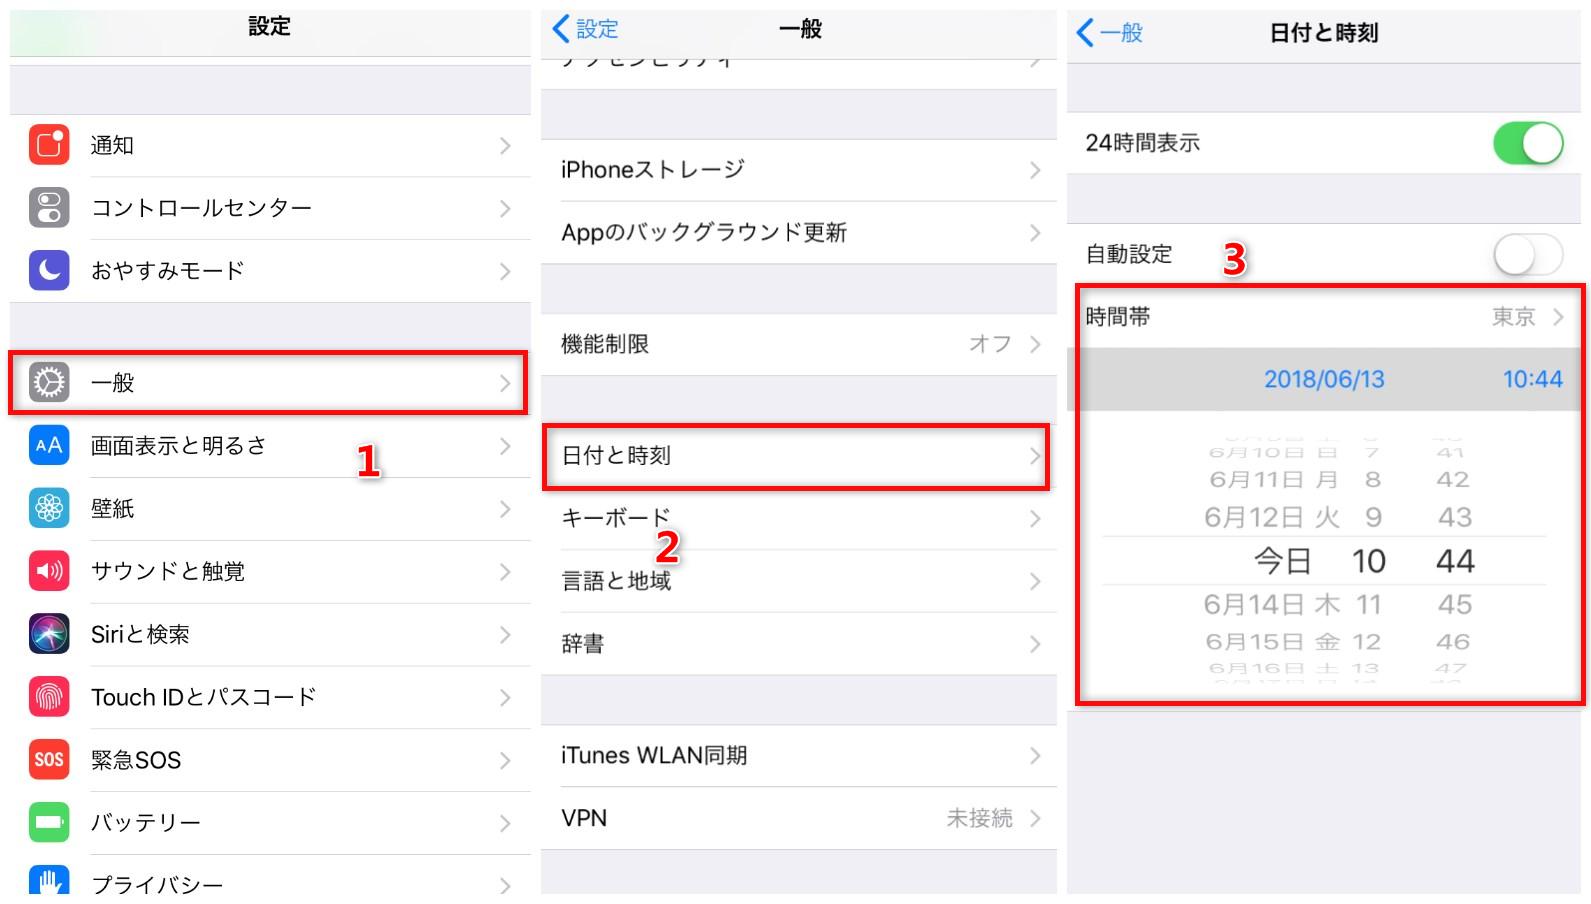 iOS 12.3・iOS 12.2・iOS 12.1・iOS 12アップデートによる不具合・バグ - iPhoneが勝手に再起動を繰り返す